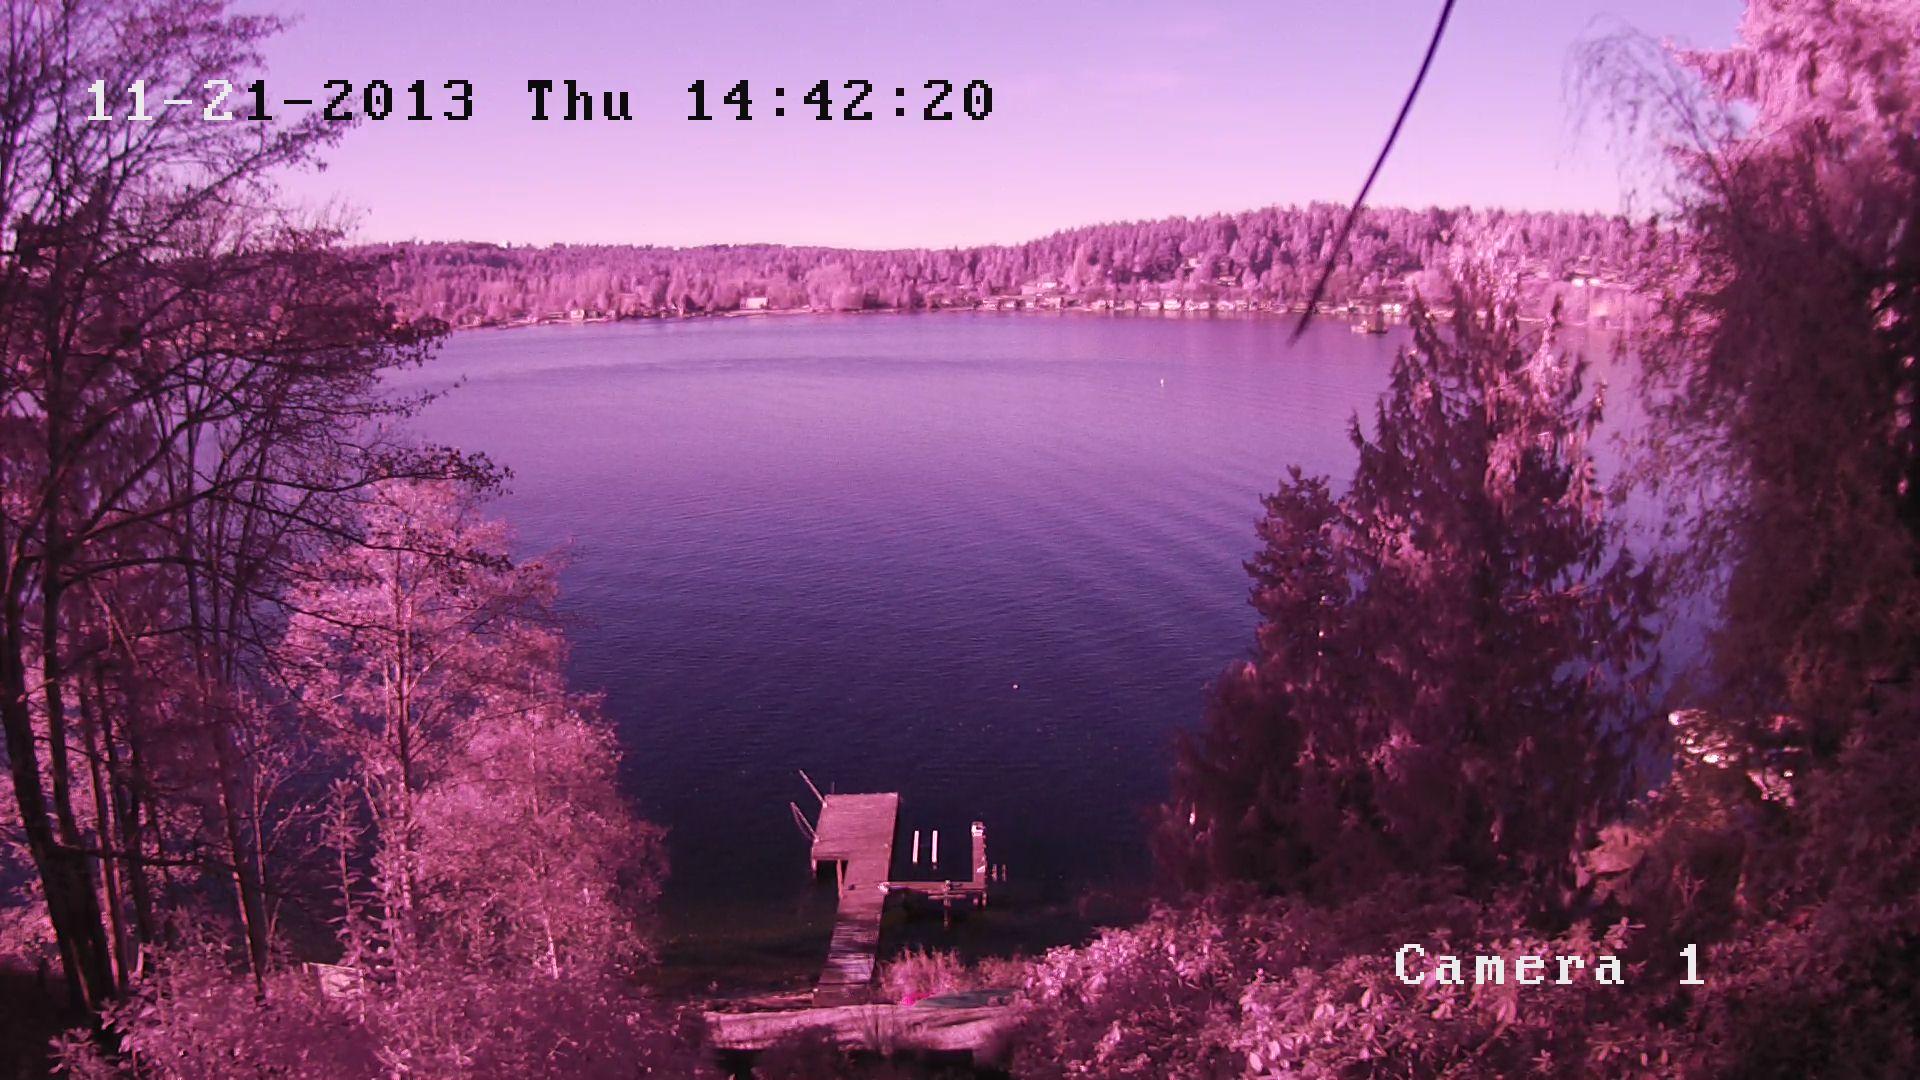 Severe Purple Hue To Camera On Swann 7200 System Cctv